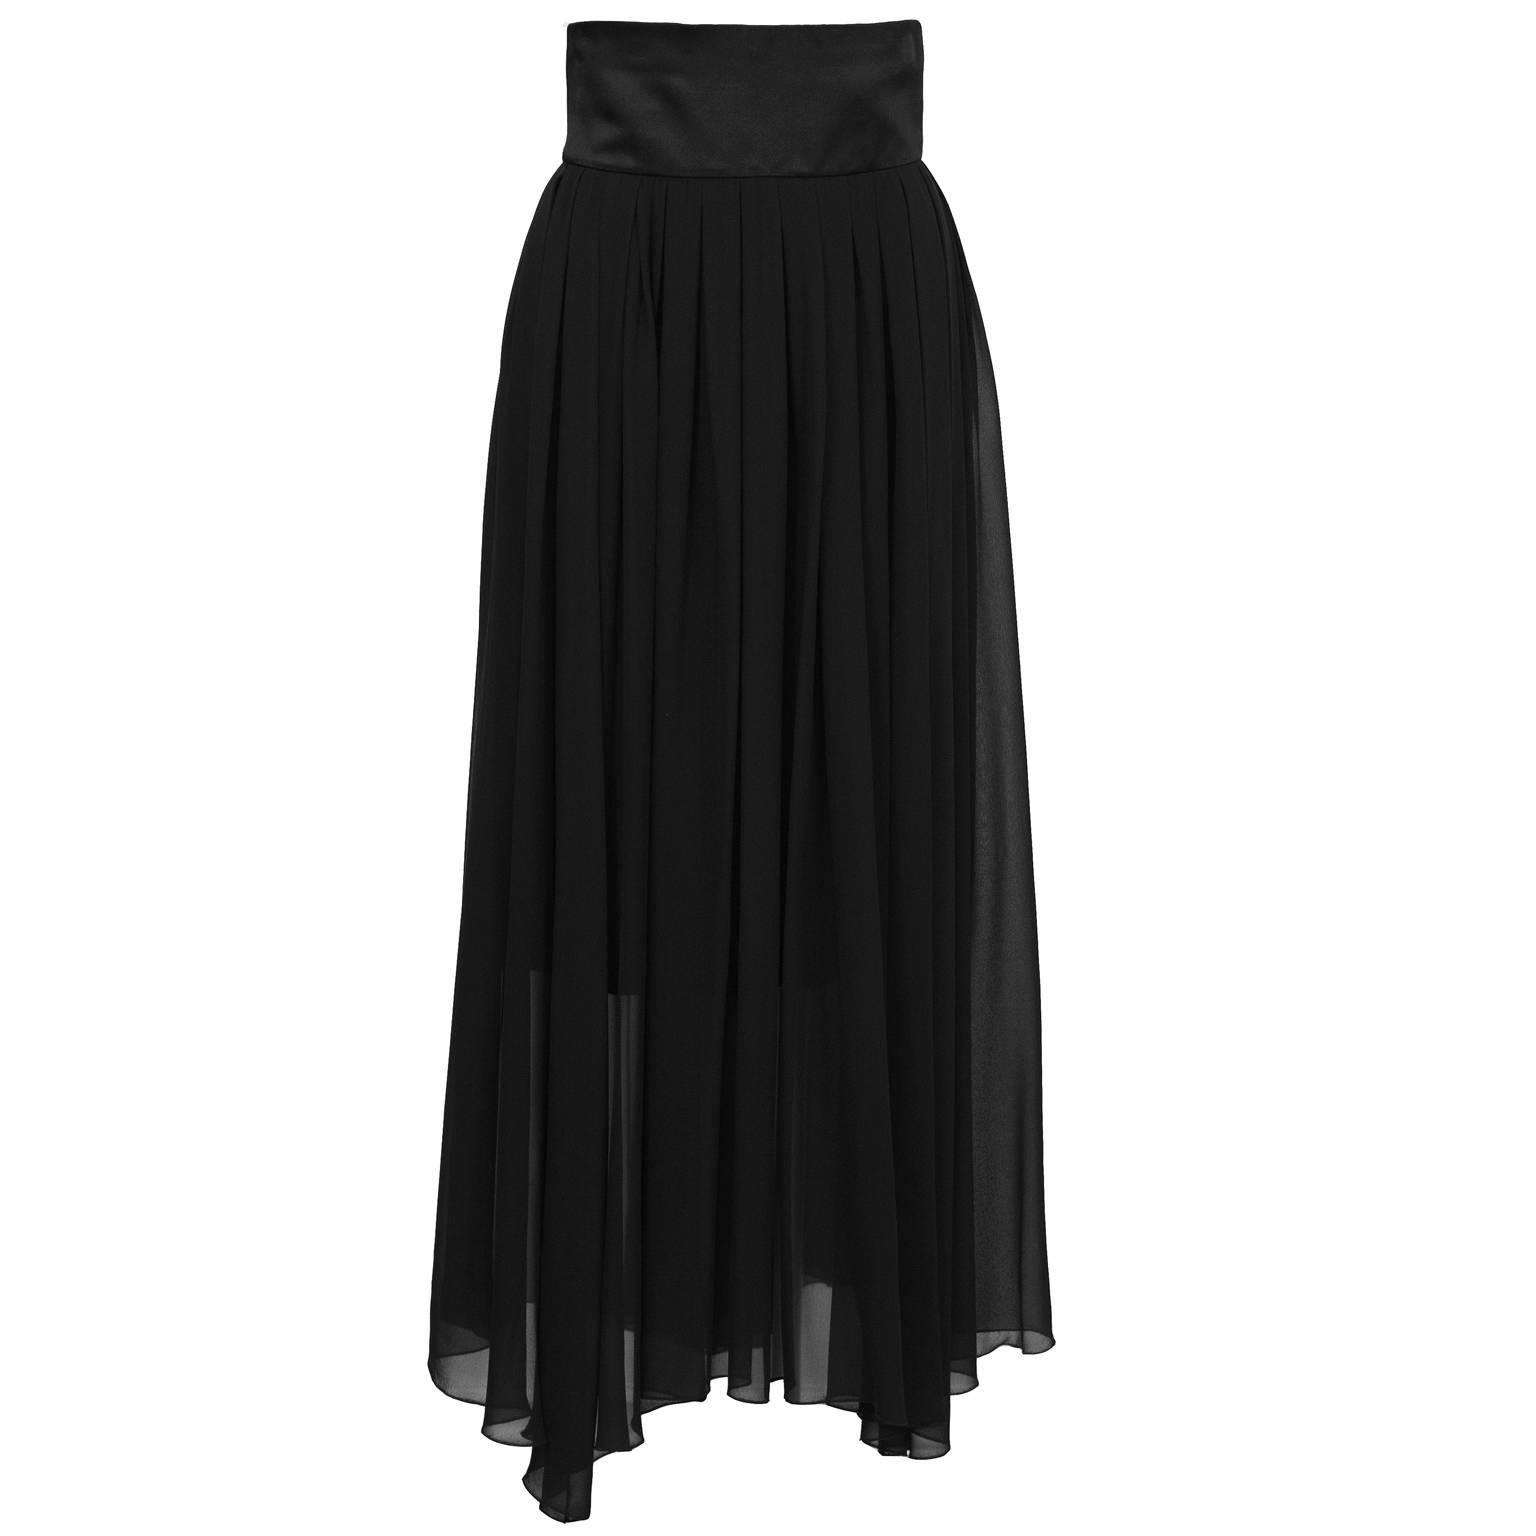 1980's Chanel Black Chiffon Skirt